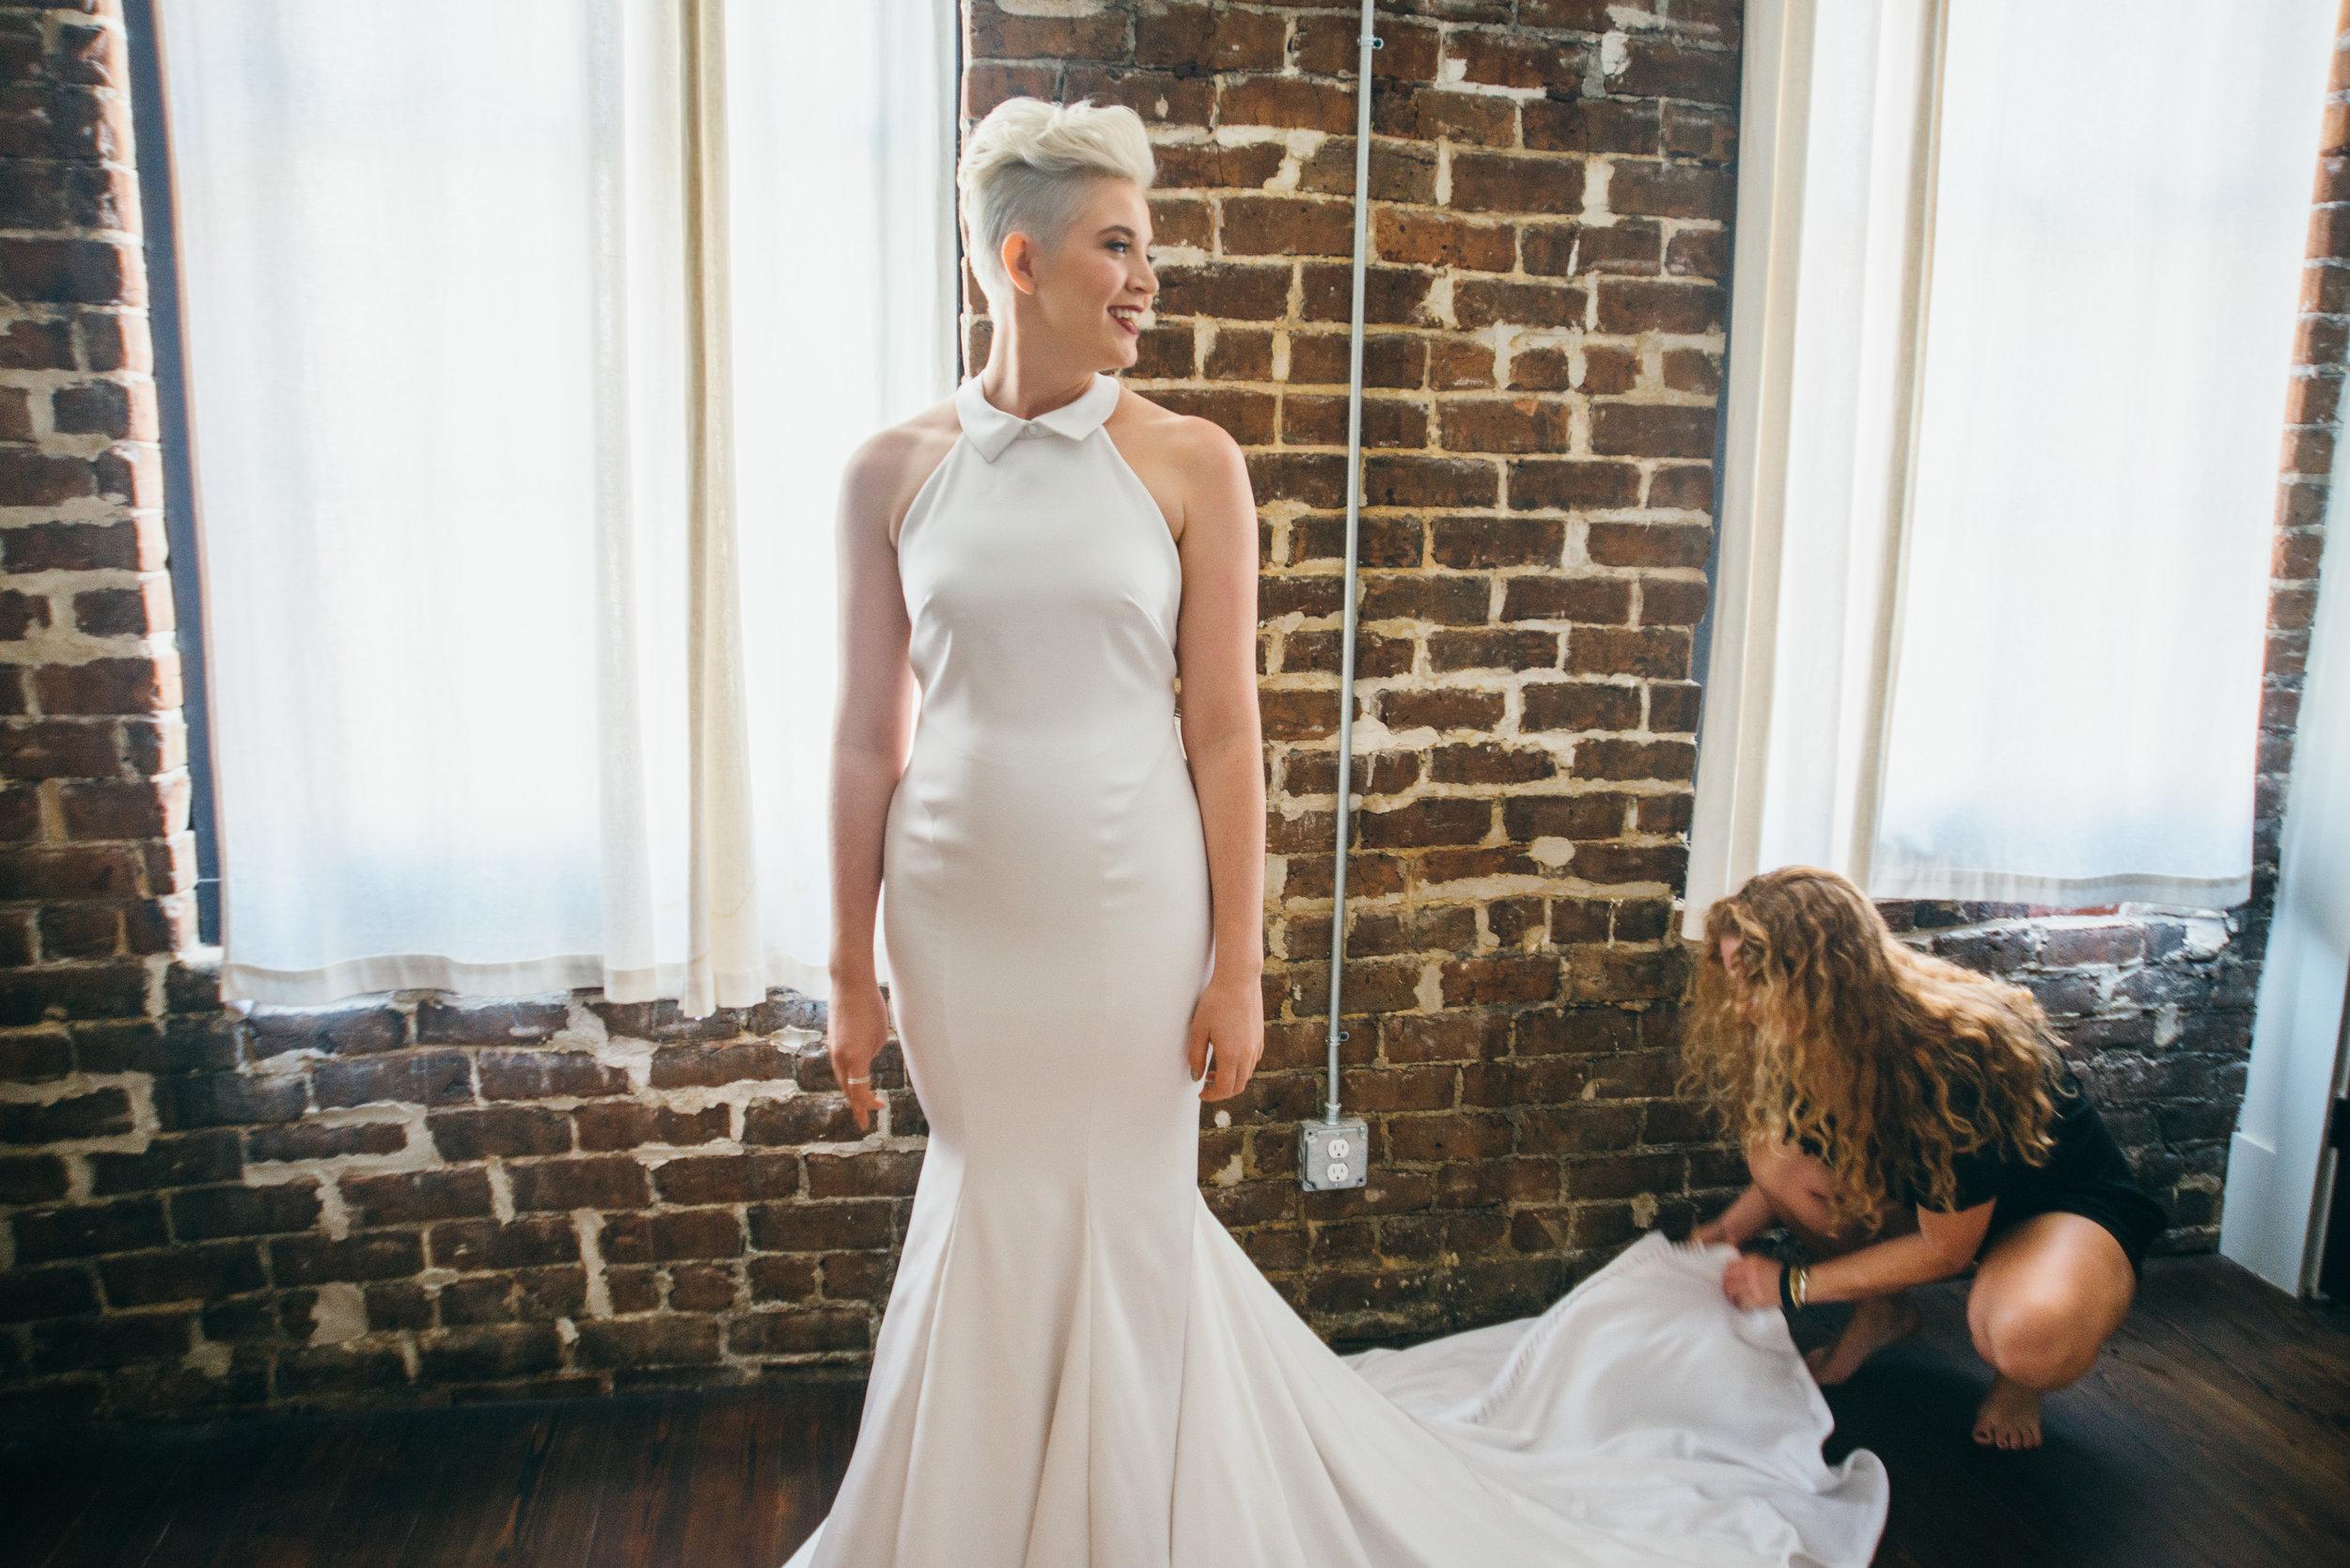 julia-hembree-photography-eden-village-church-wedding-savannah-warehouse-wedding-ivory-and-beau-bridal-boutique-savannah-florist-savannah-wedding-planner-savannah-event-design-scad-wedding-artist-wedding-savannah-funky-wedding-handmade-wedding-8.jpg